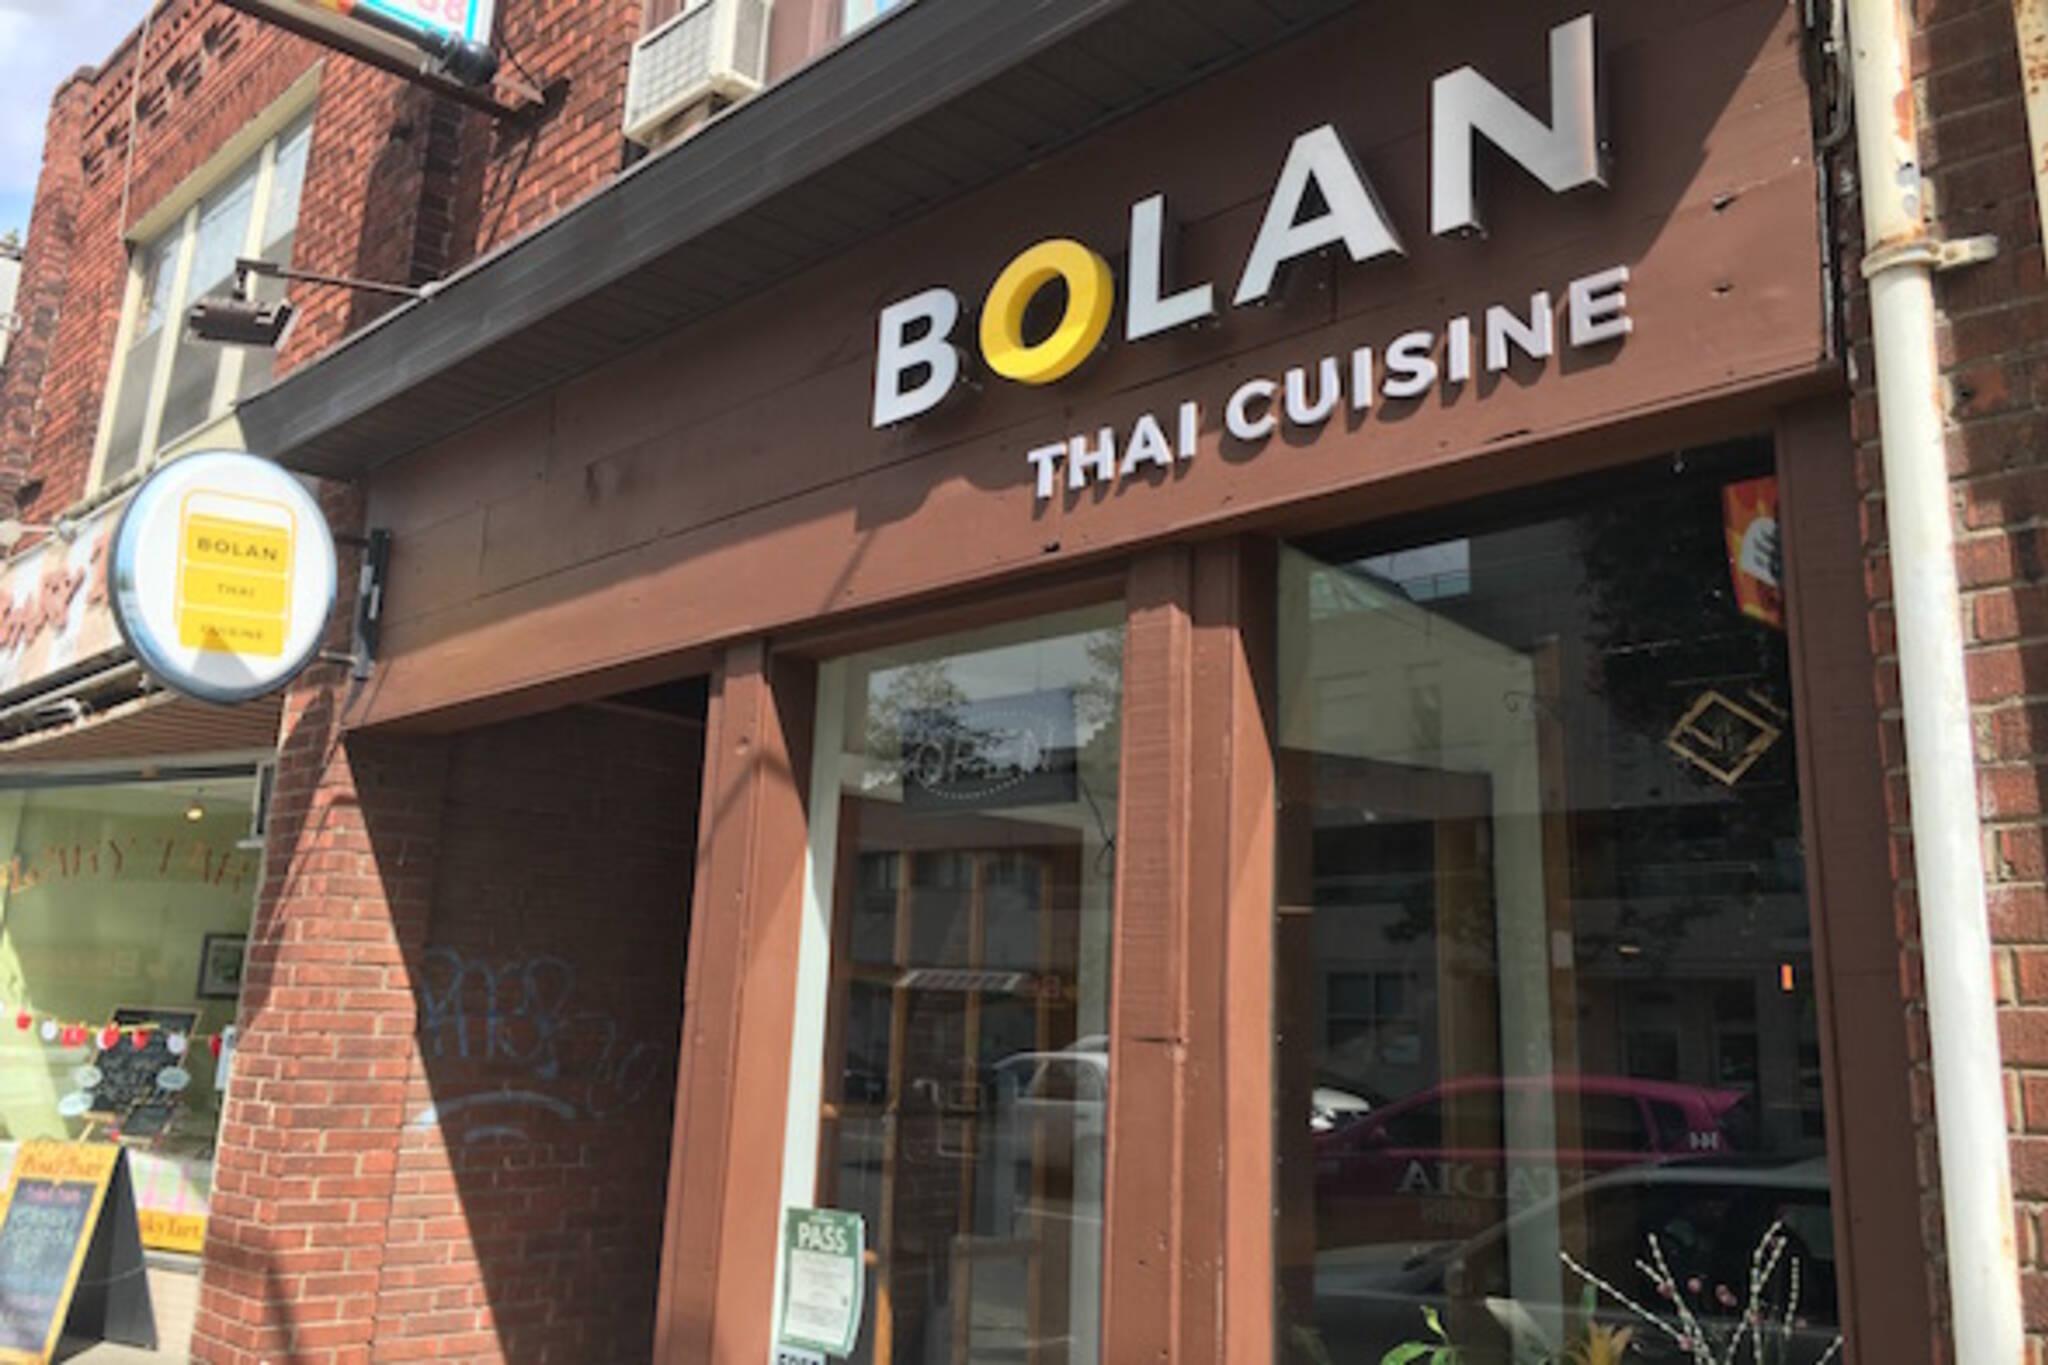 Bolan Thai Cuisine Toronto